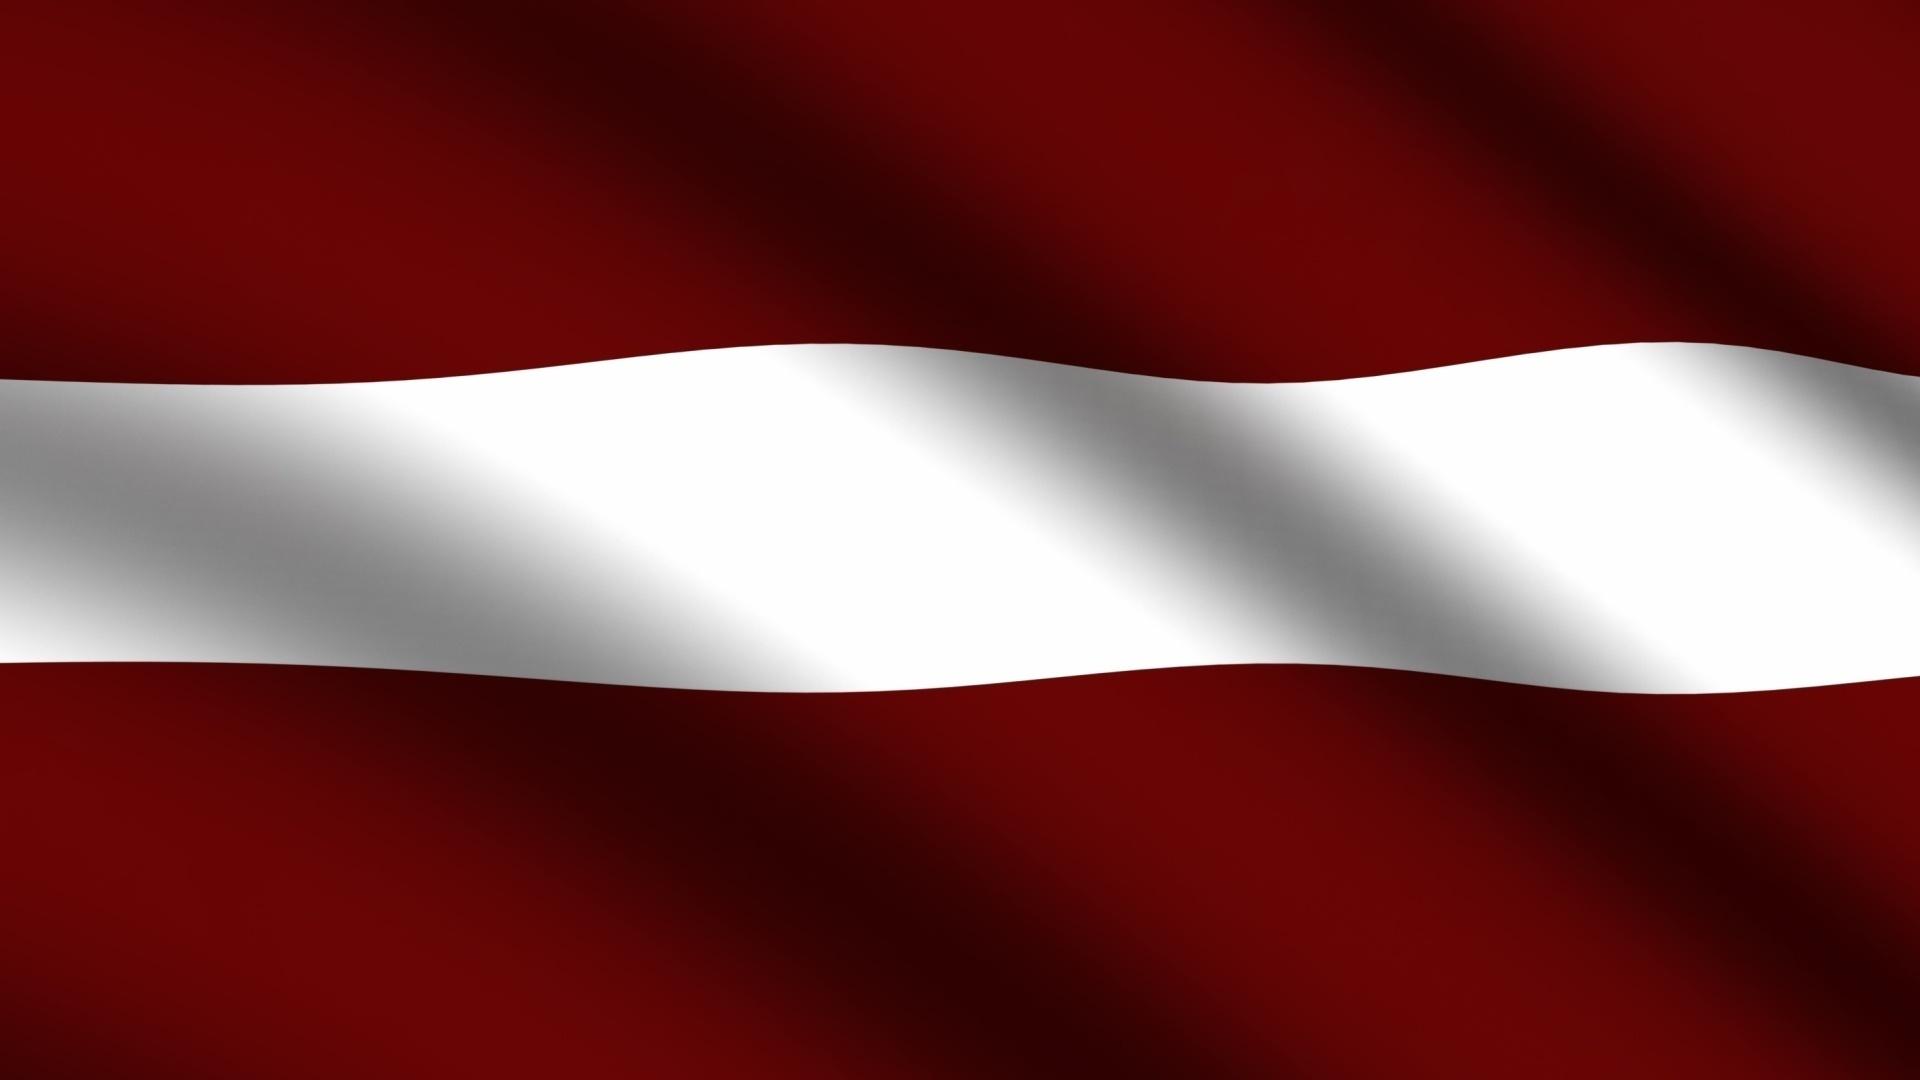 Latvia Flag Archives - HDWallSource.com - HDWallSource.com